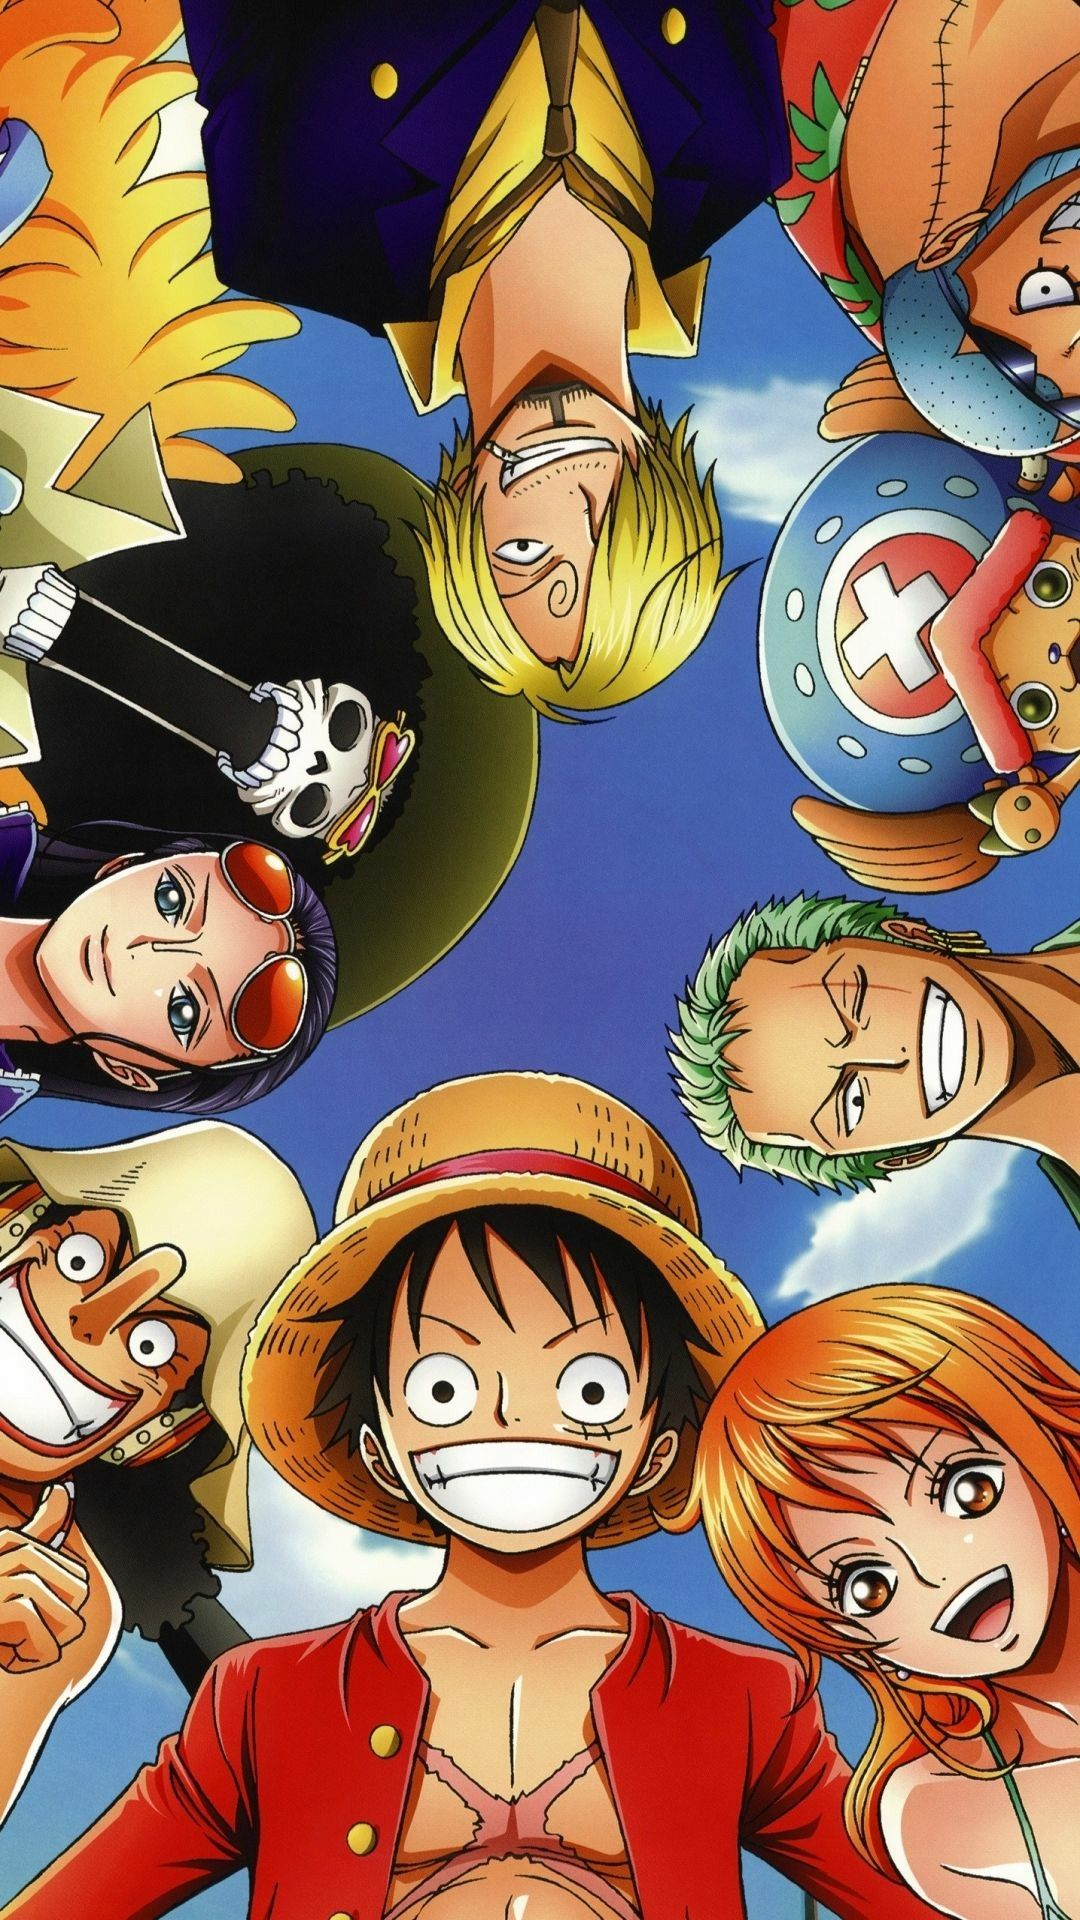 Fond D Ecran Manga One Piece